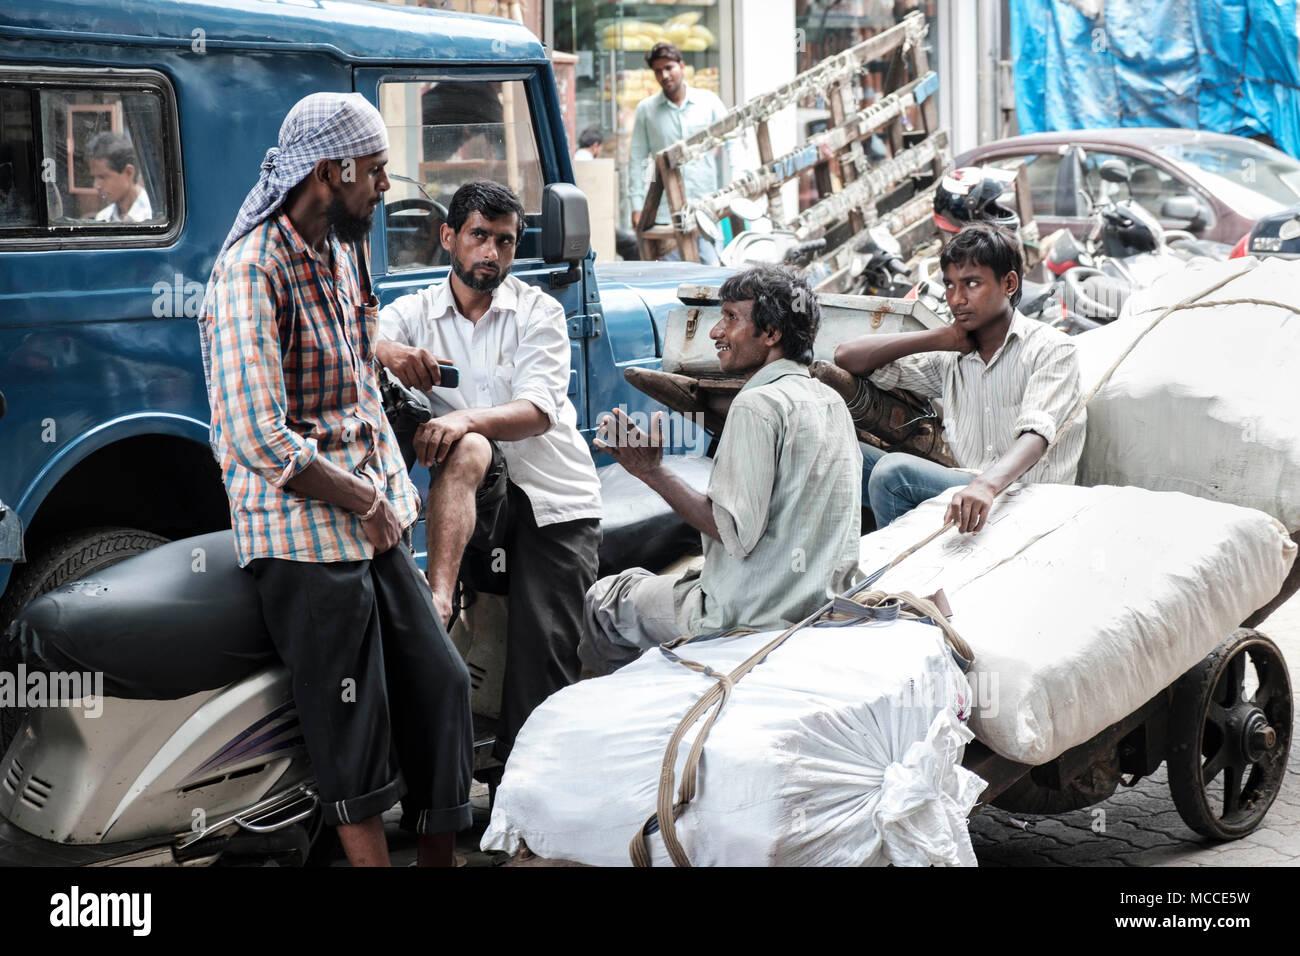 Market traders talking together on a work break, Nagdevi street near Crawford market, Mumbai - Stock Image